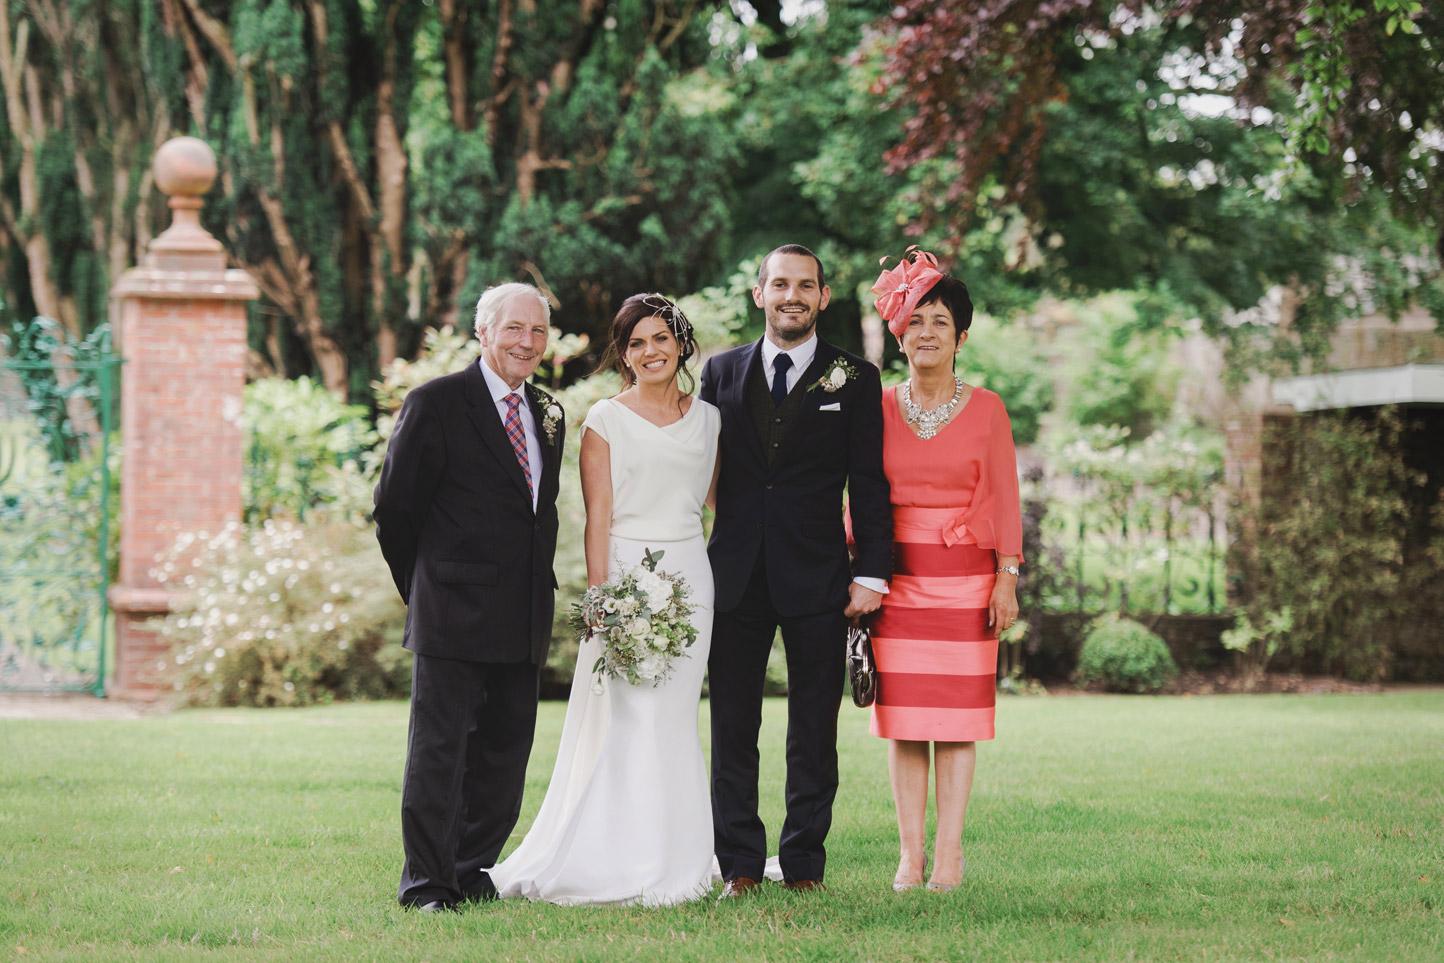 Group photo in Tankardstown House Meath Wedding photographers meath ireland